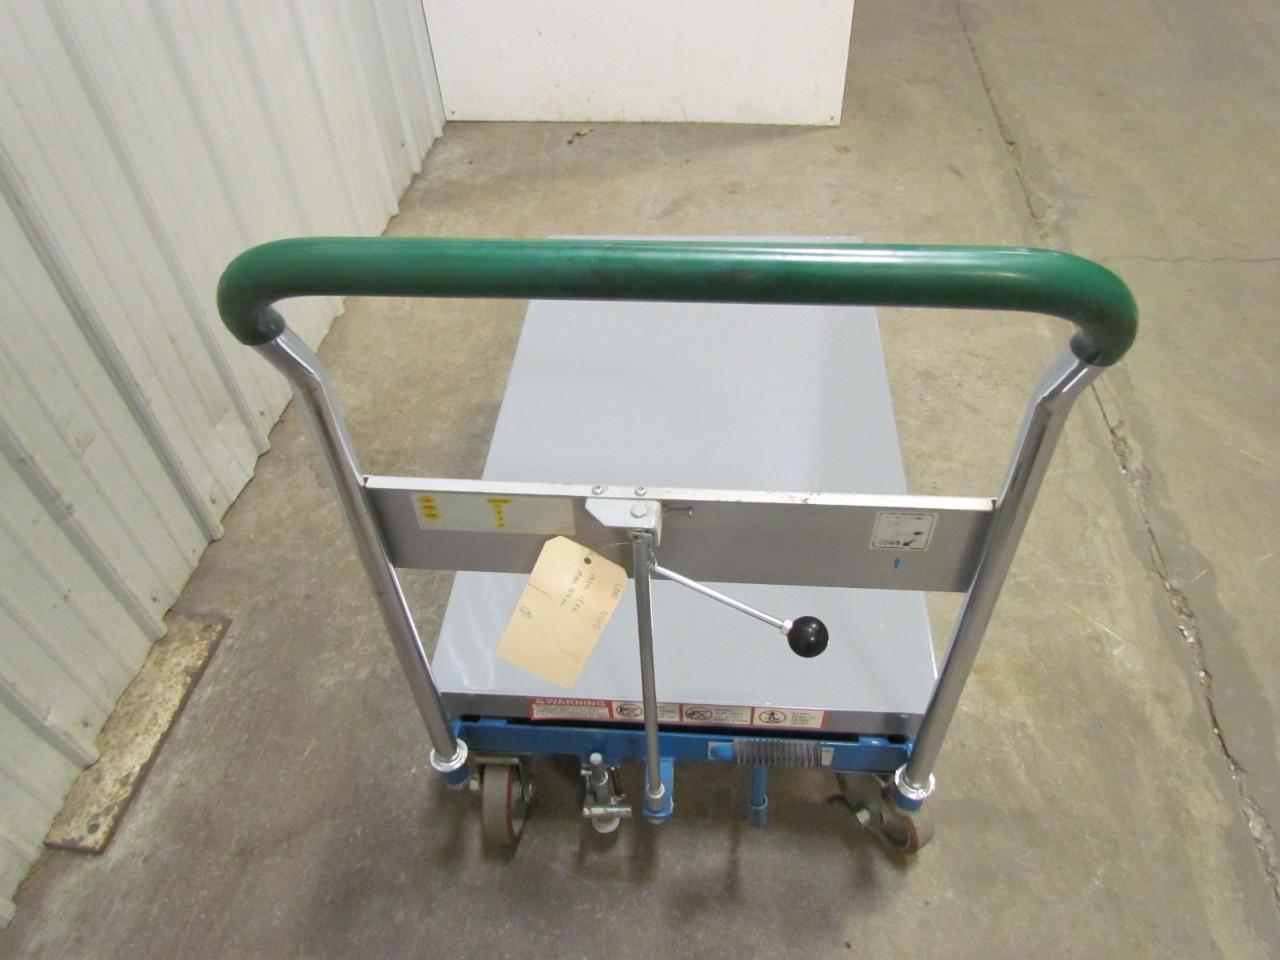 Hydraulic Scissor Lift Carts : Dandy a hydraulic scissor lift table cart lb load